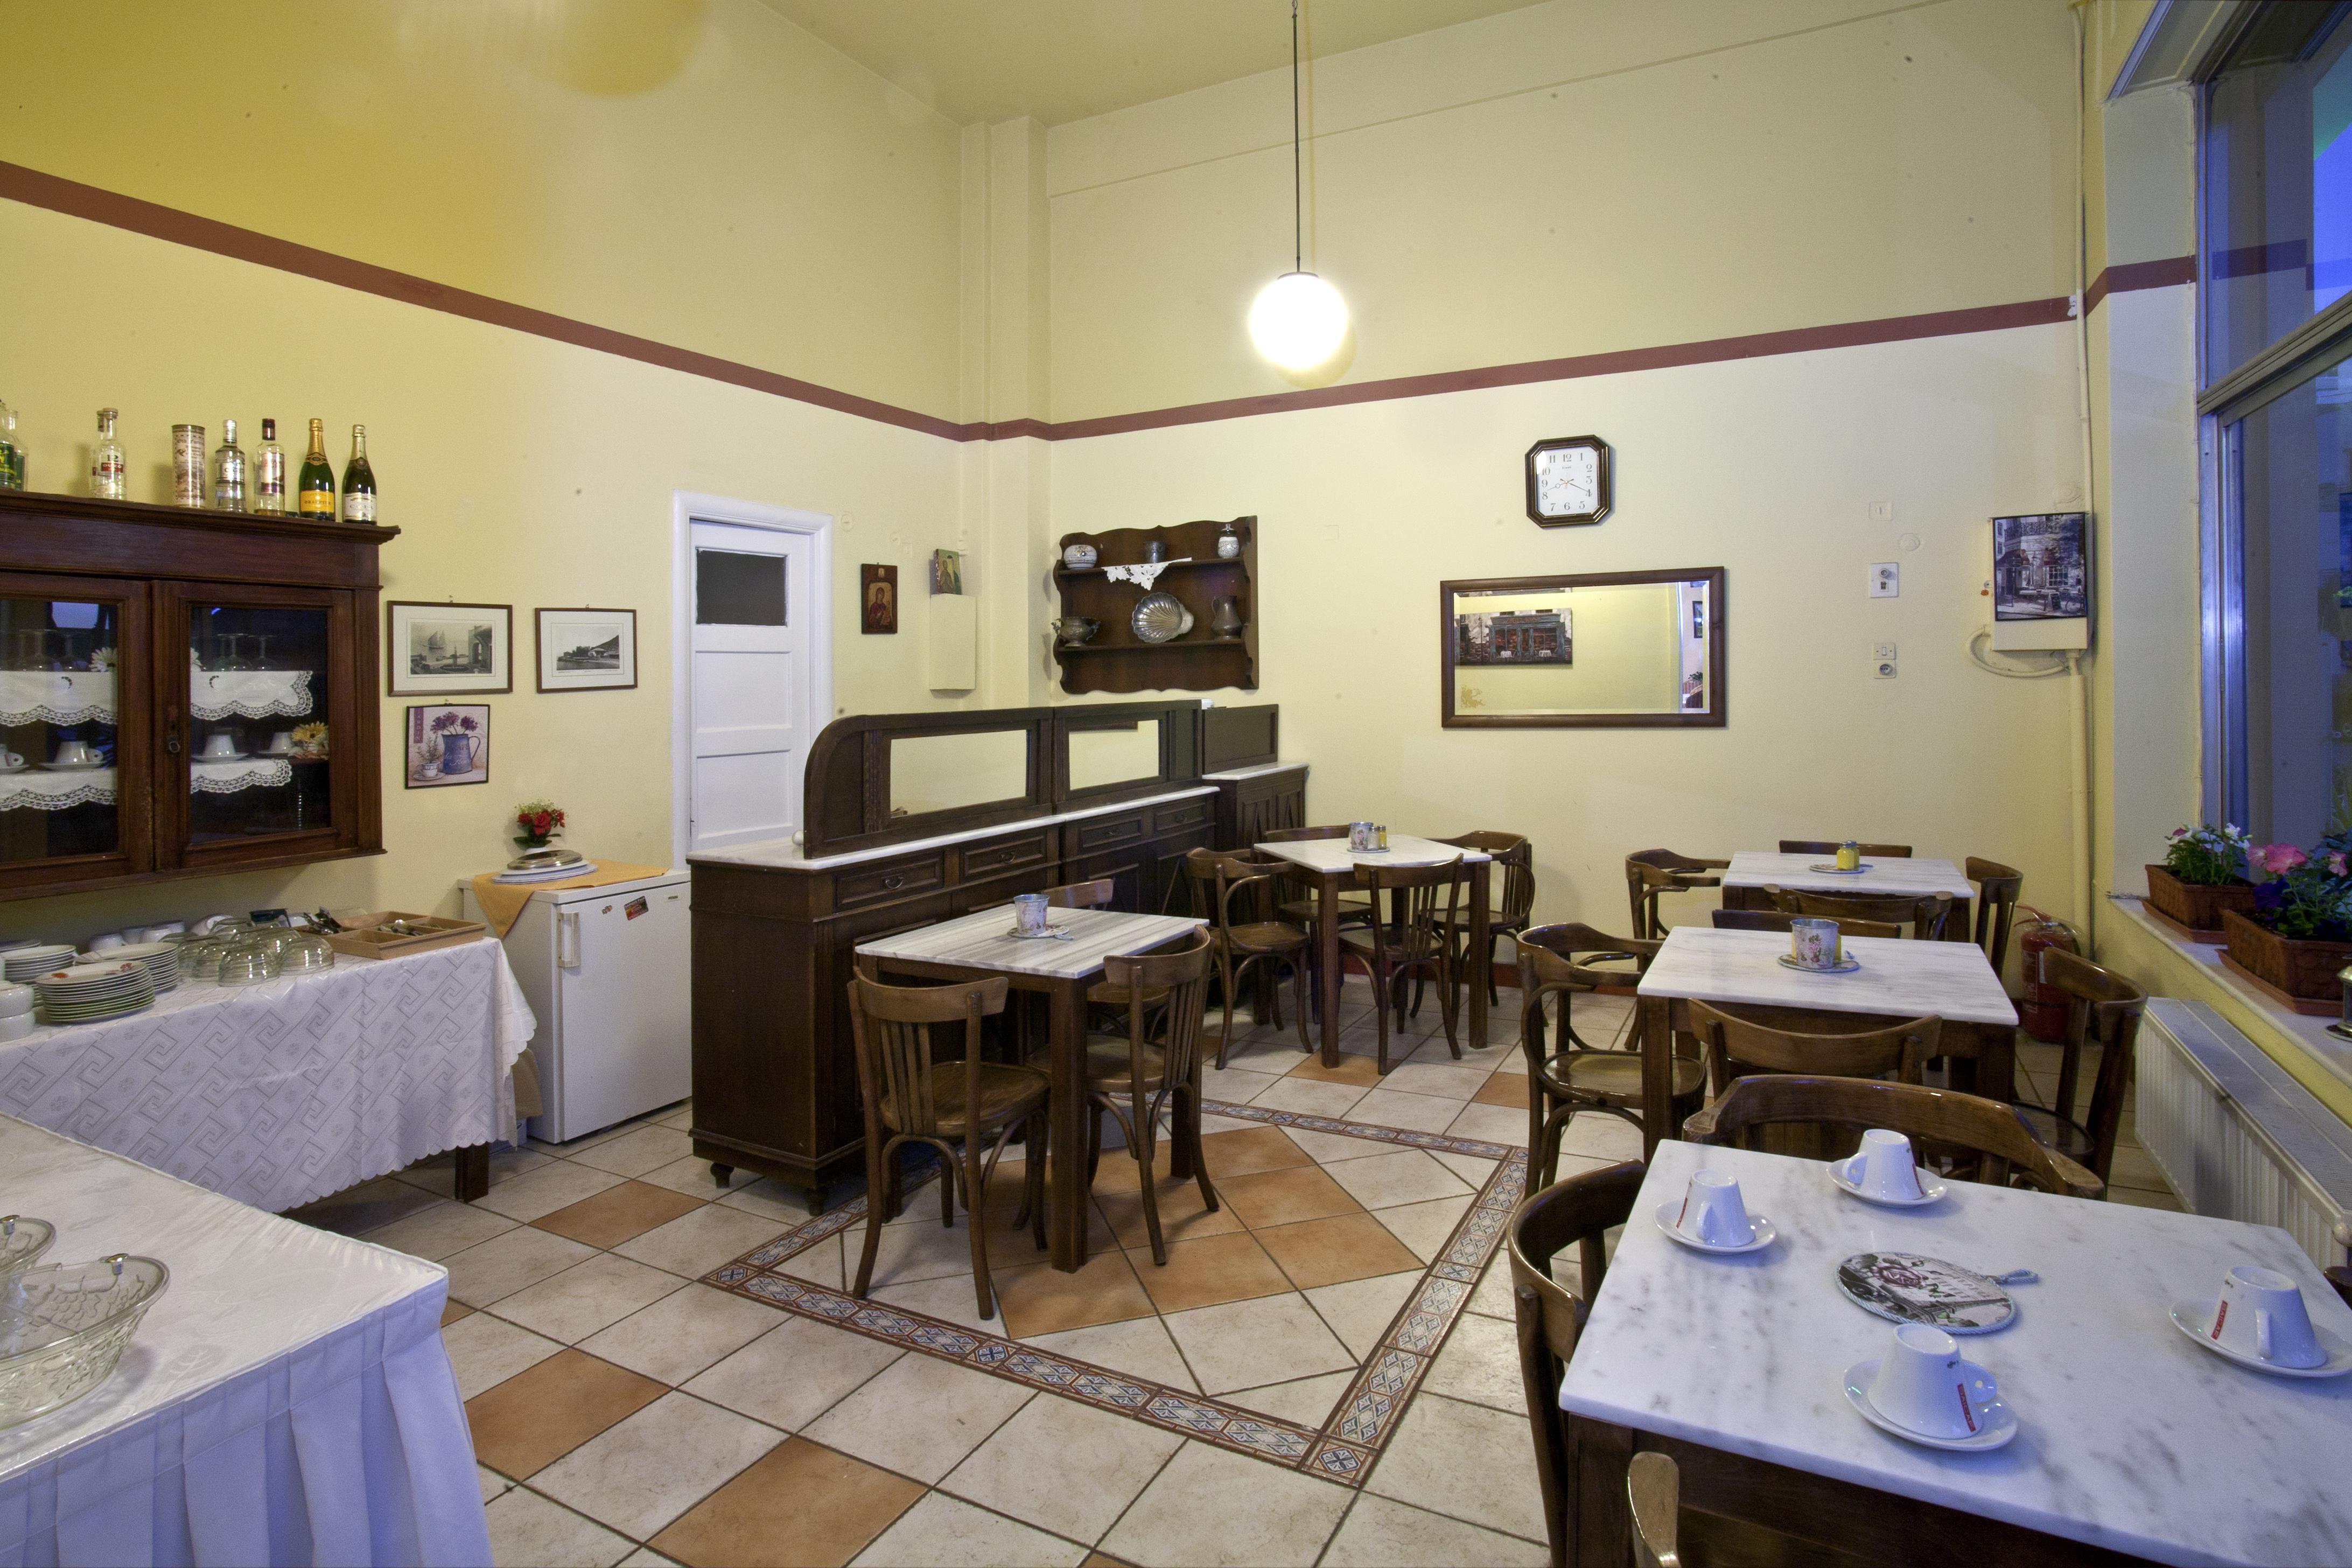 Hotel Vasilikon Dnevni Boravak